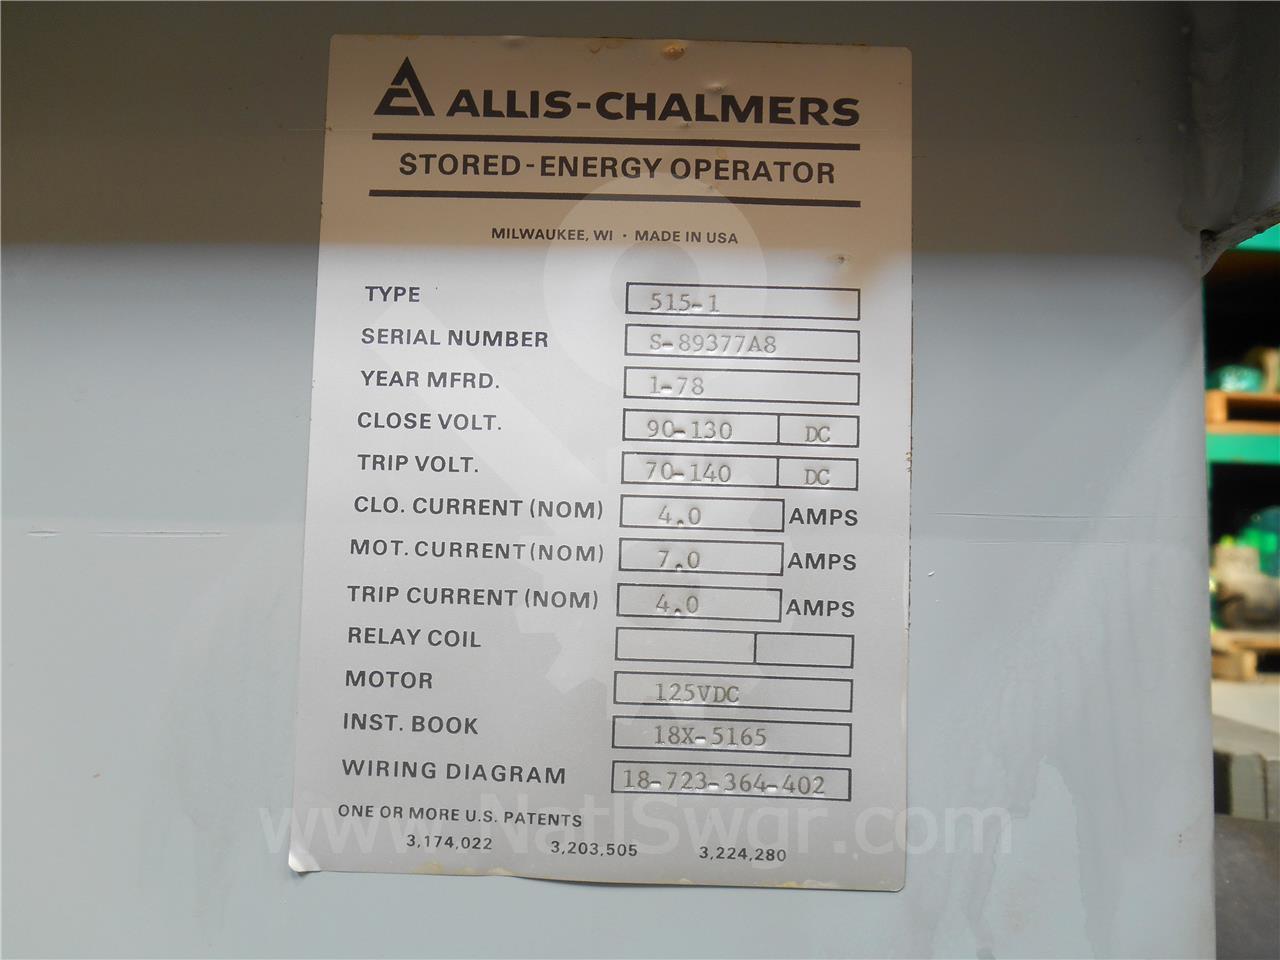 Sie / Allis Chalmers 2000A AC RUPTAIR MA-250C1 Allis Chalmers Induction Motor Wiring Diagram on allis chalmers compressor, ihc wiring diagram, bush hog wiring diagram, atlas wiring diagram, allis chalmers ignition switch, allis chalmers tires, allis chalmers firing order, allis chalmers fan belt, allis chalmers wire harness, allis chalmers service, allis chalmers seats, allis chalmers transformer, allis chalmers fuel tank, dynapac wiring diagram, allis chalmers coil, gilson wiring diagram, allis chalmers assembly, bomag wiring diagram, agco allis wiring diagram, lull wiring diagram,